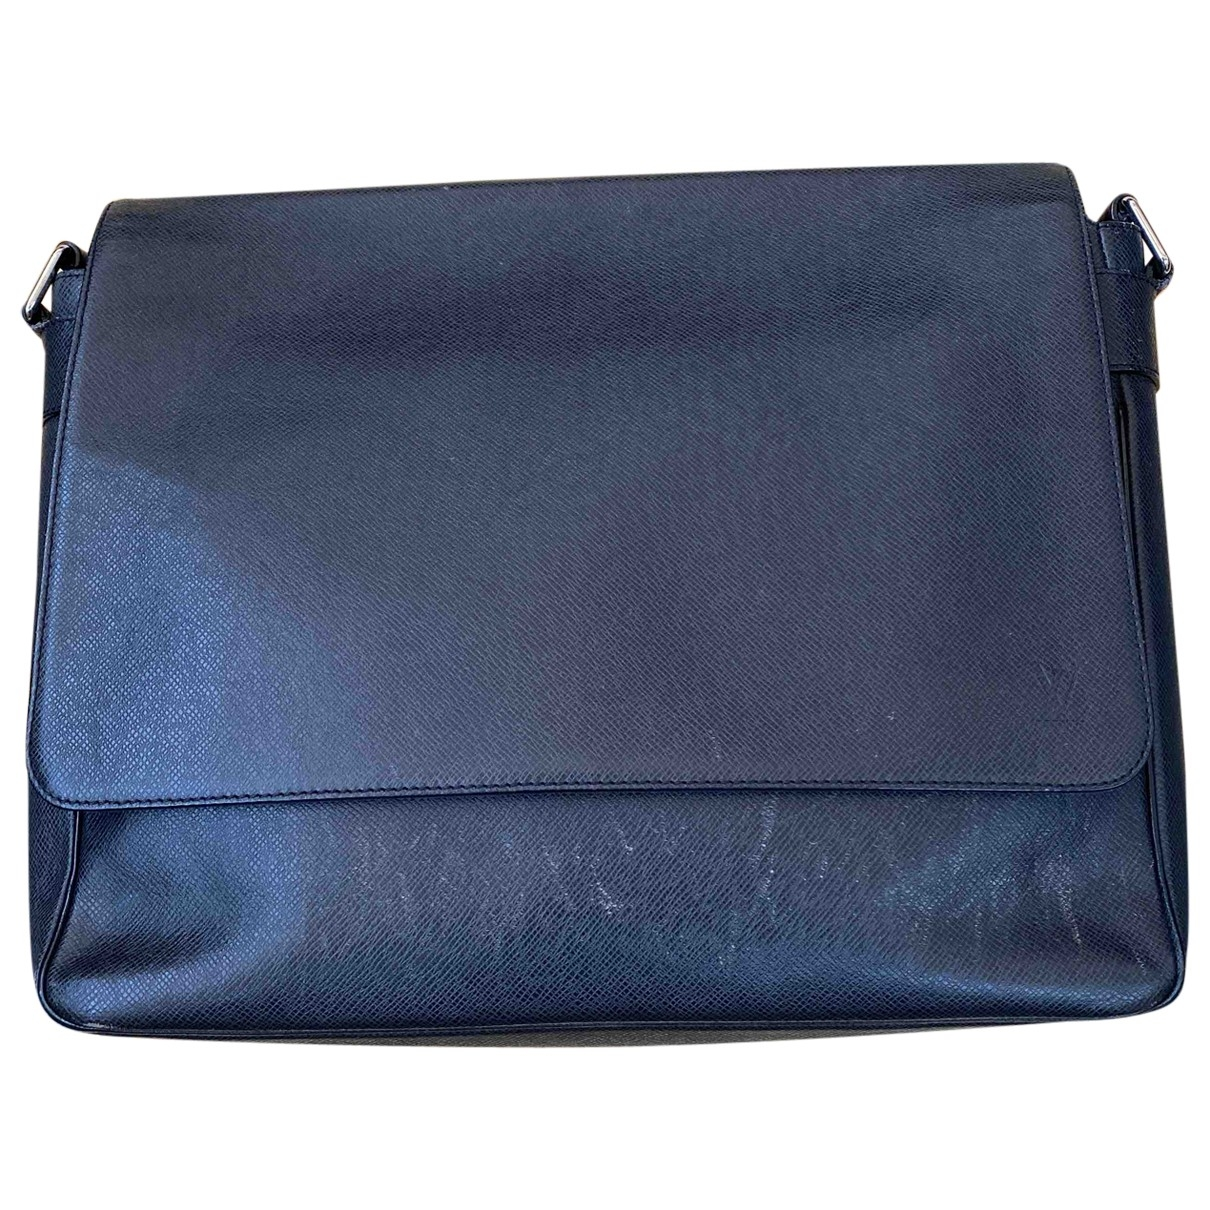 Louis Vuitton Roman Anthracite Leather bag for Men \N